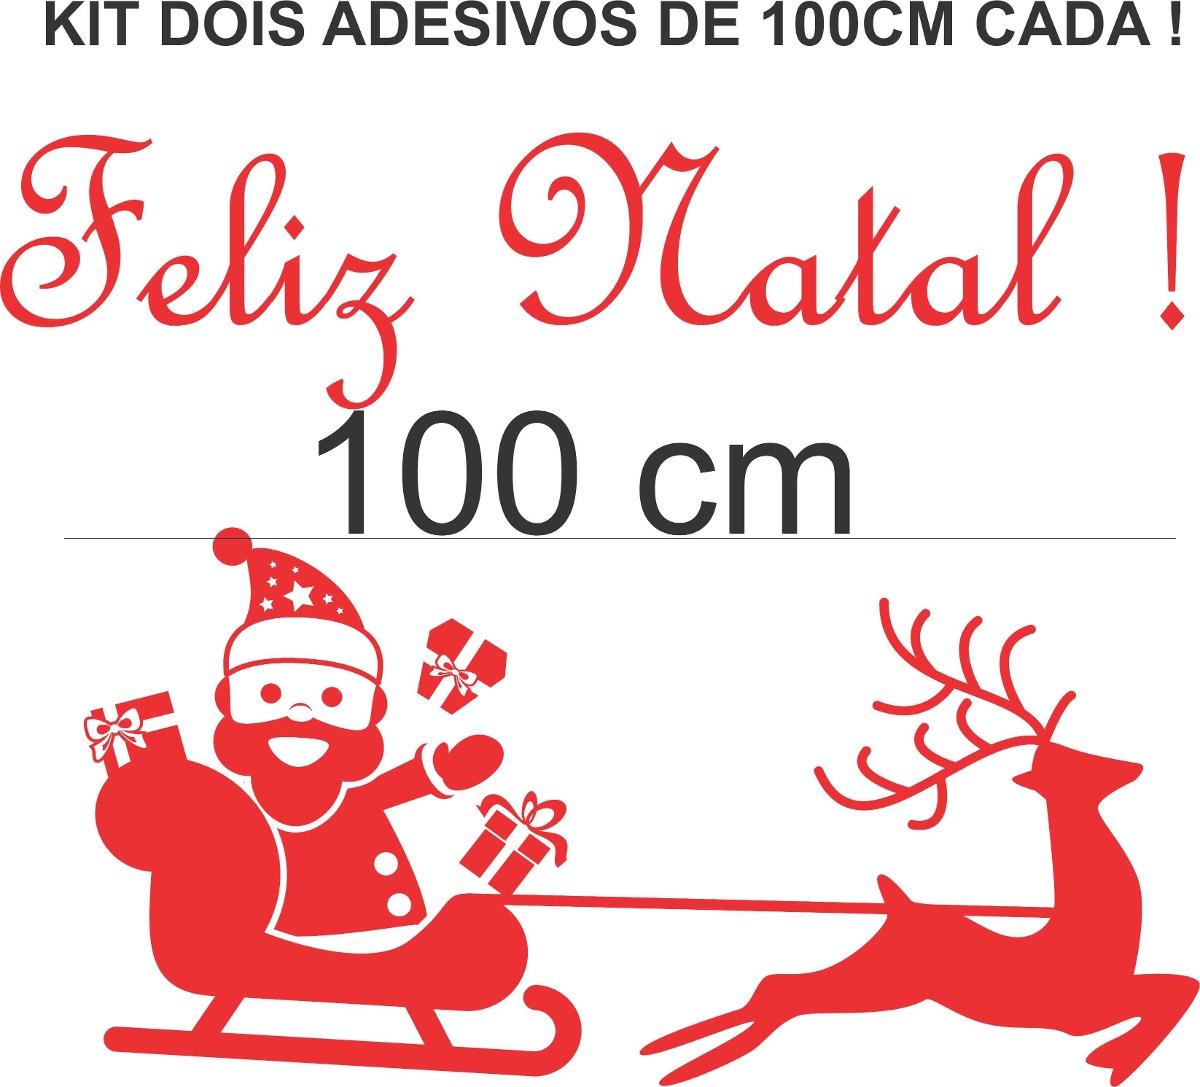 Aparador Vitrina Comedor ~ Adesivos Decorativos Natal Noel Vitrine Loja Vidro Parede